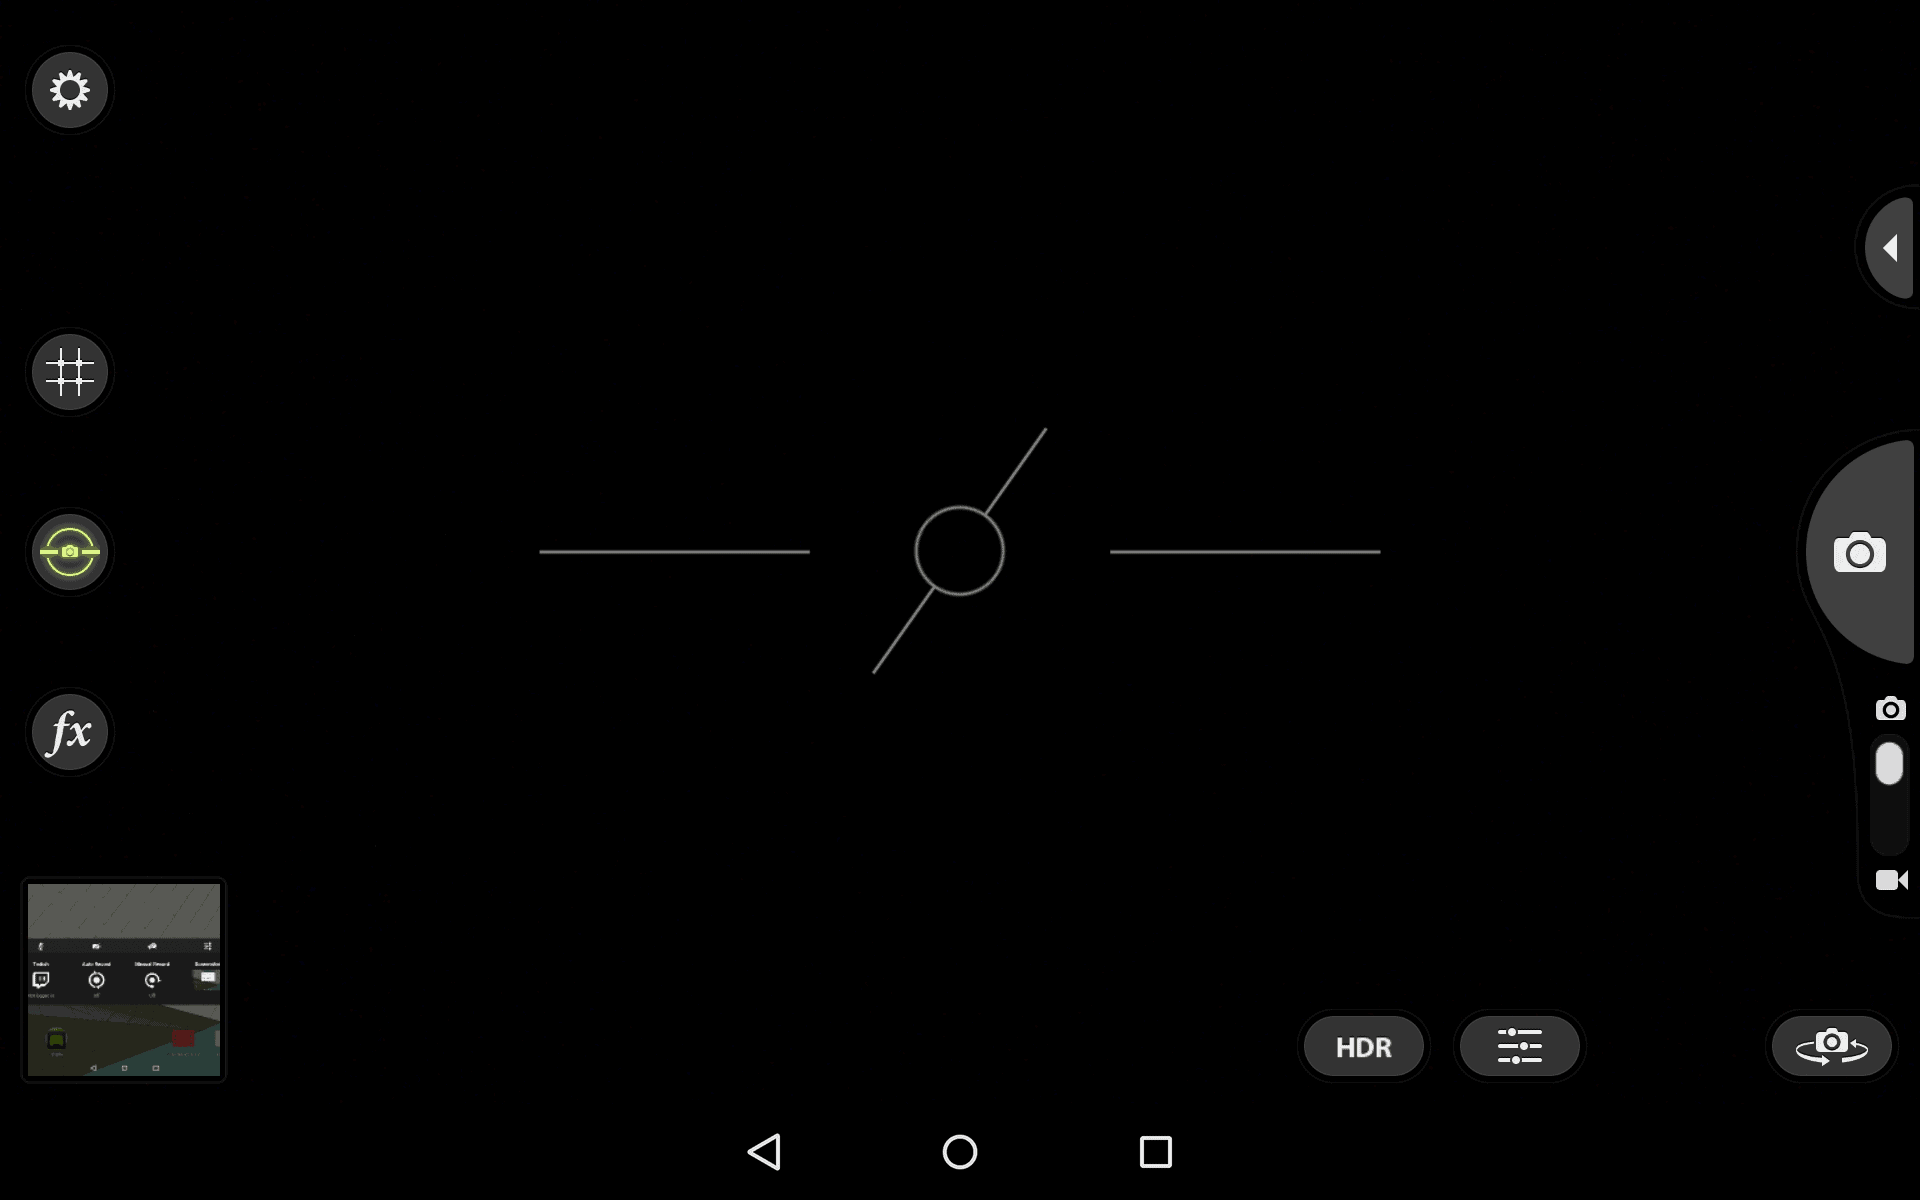 Screenshot 2015 11 12 09 11 50